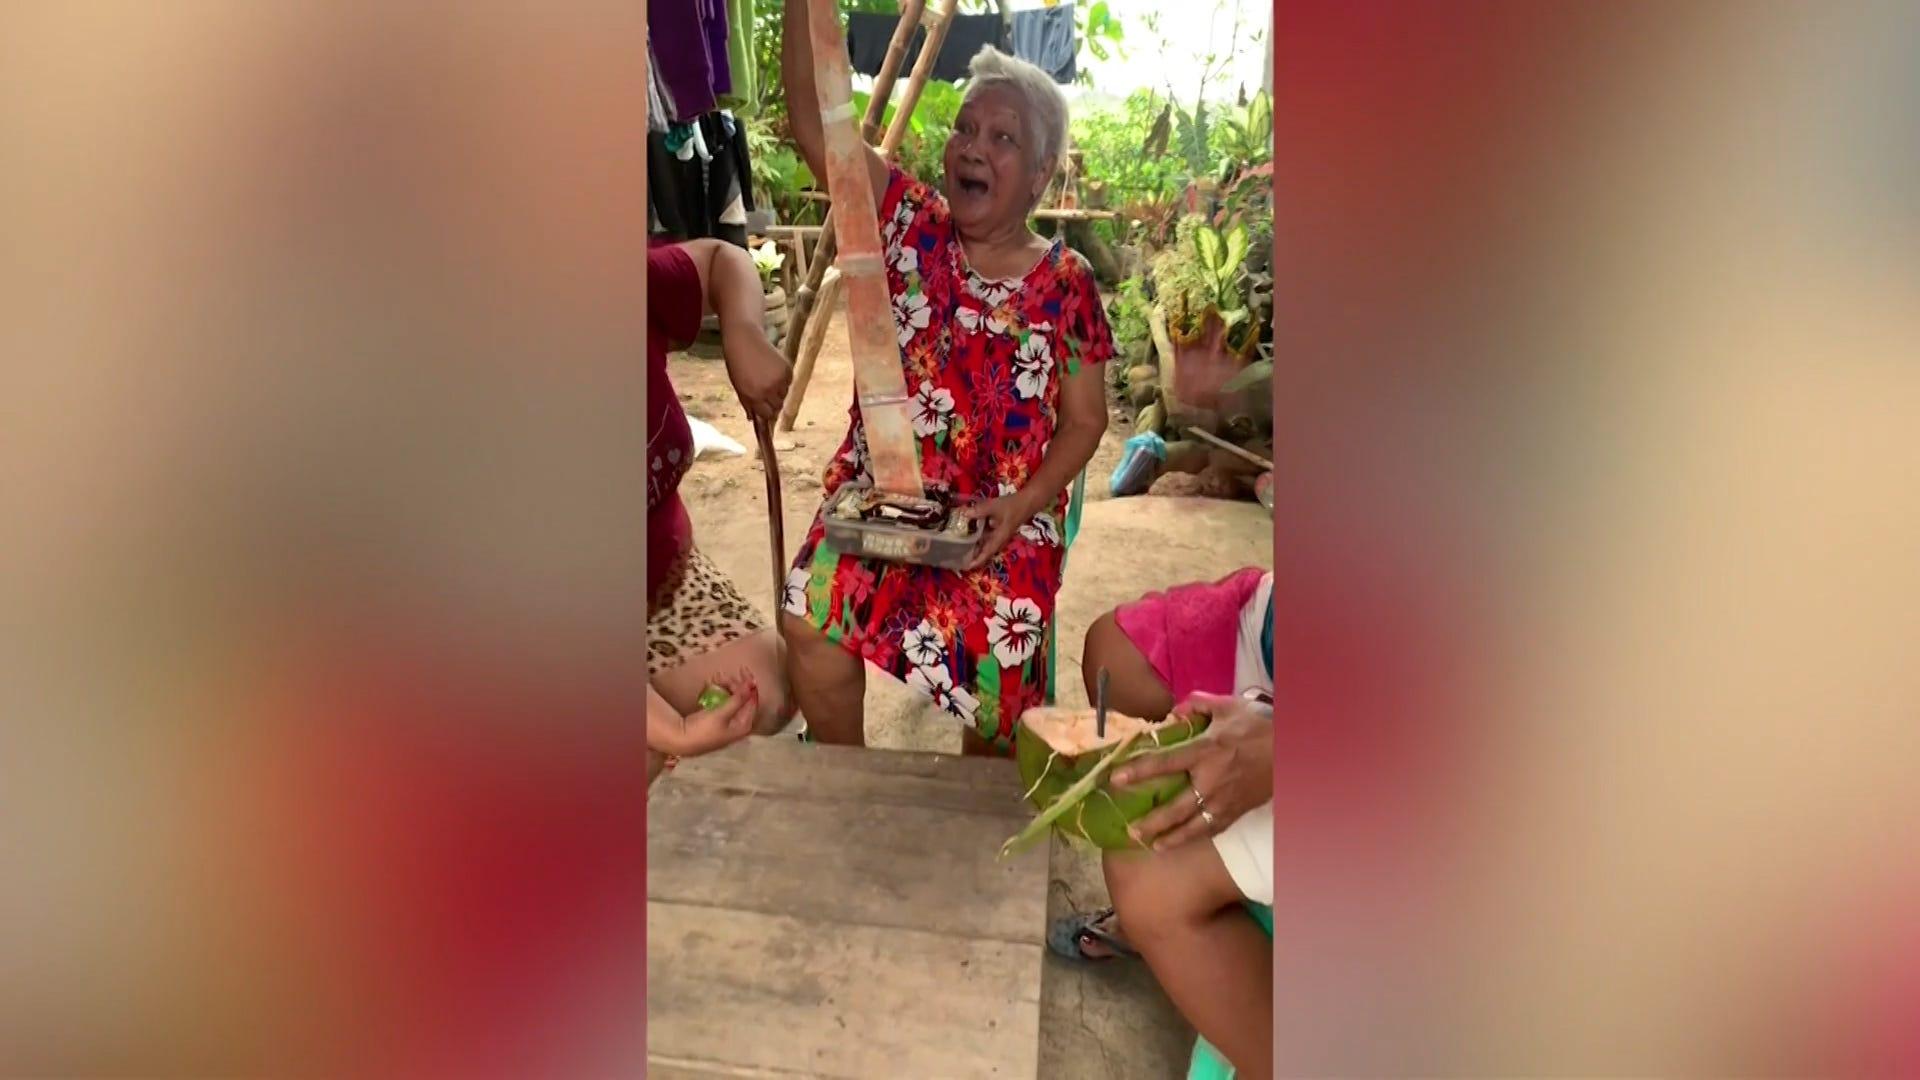 94-year-old grandma gets surprise in birthday cake